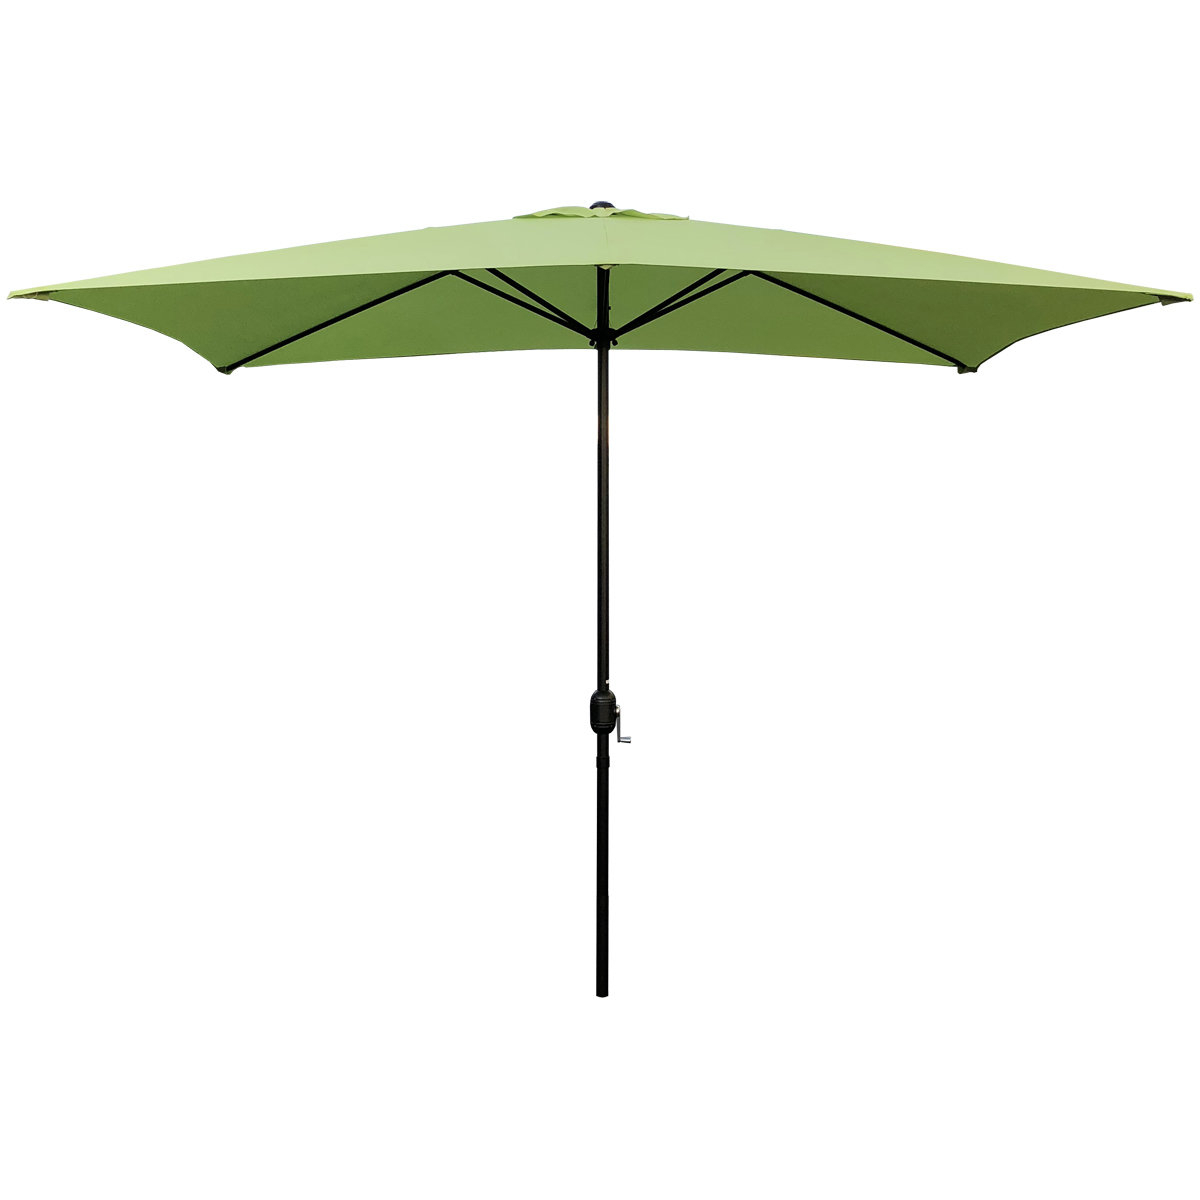 2020 Bradford Patio Market Umbrellas For Hashtag Home Bradford 10' X (View 4 of 20)